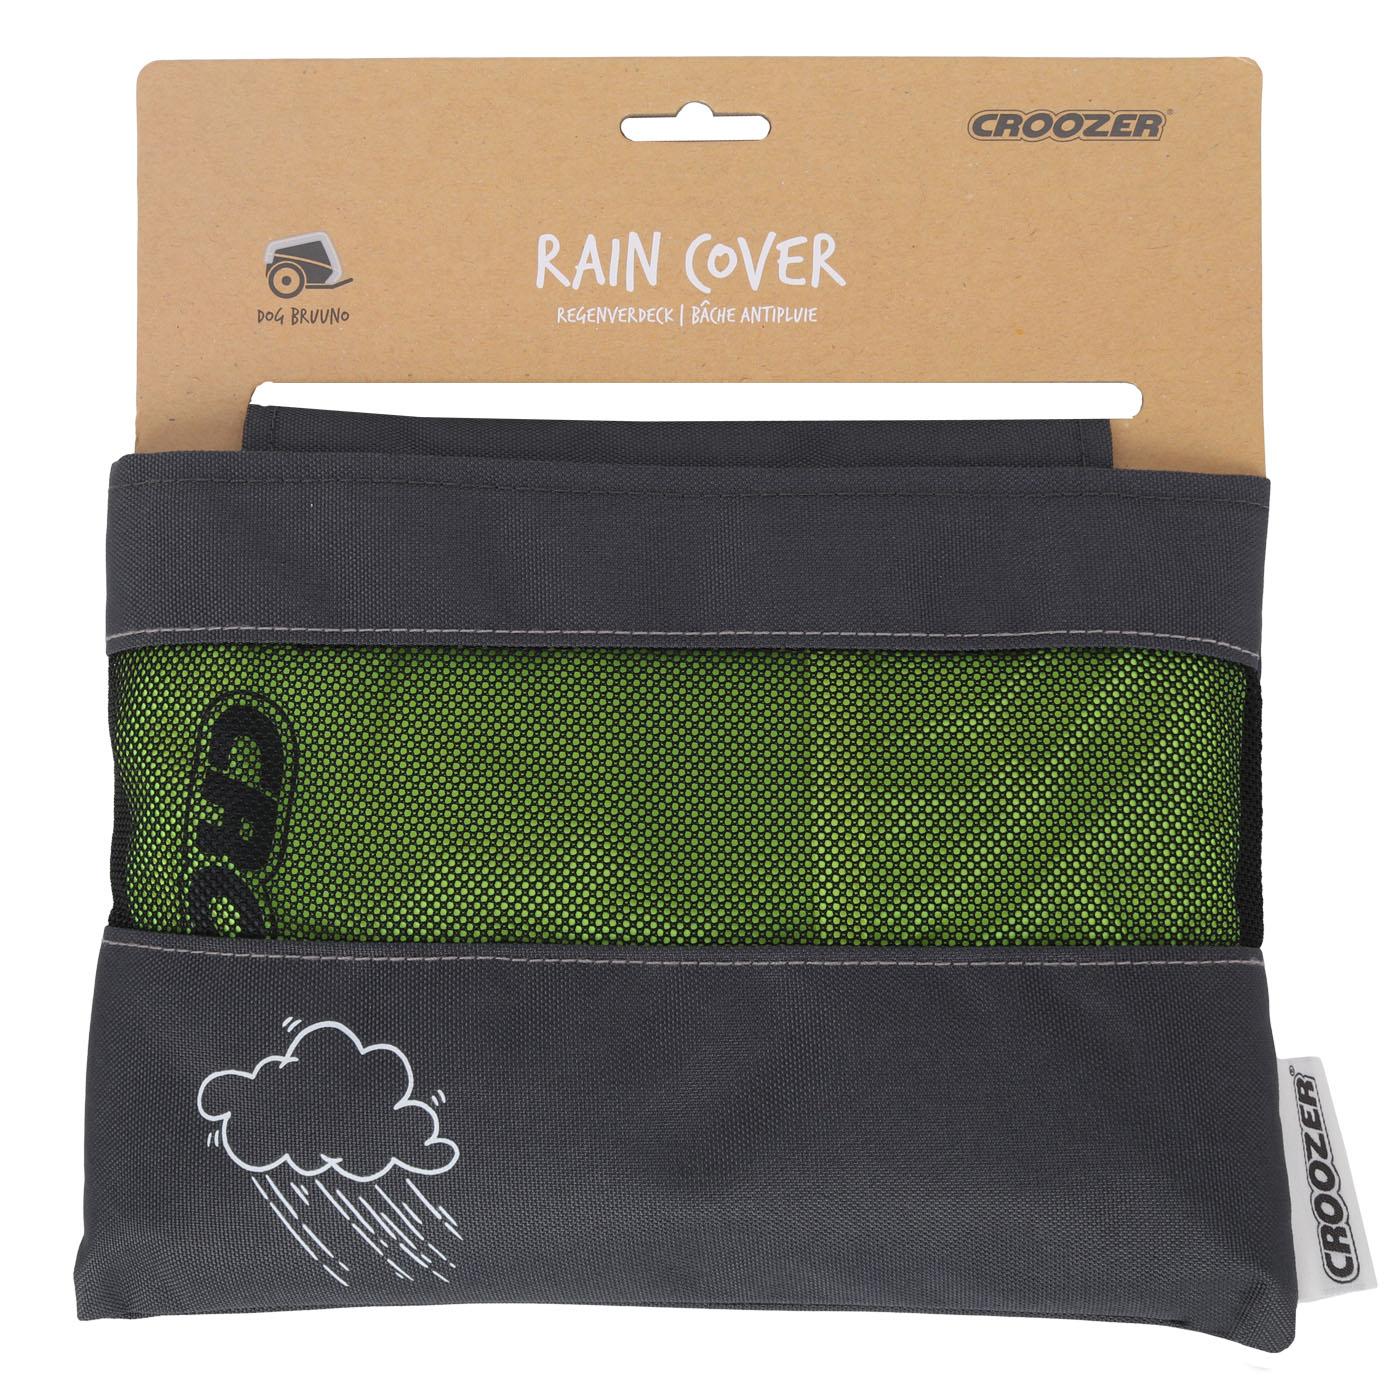 Picture of Croozer Rain Cover for Bike Trailer Dog Bruuno / Dog XXL - lightning yellow